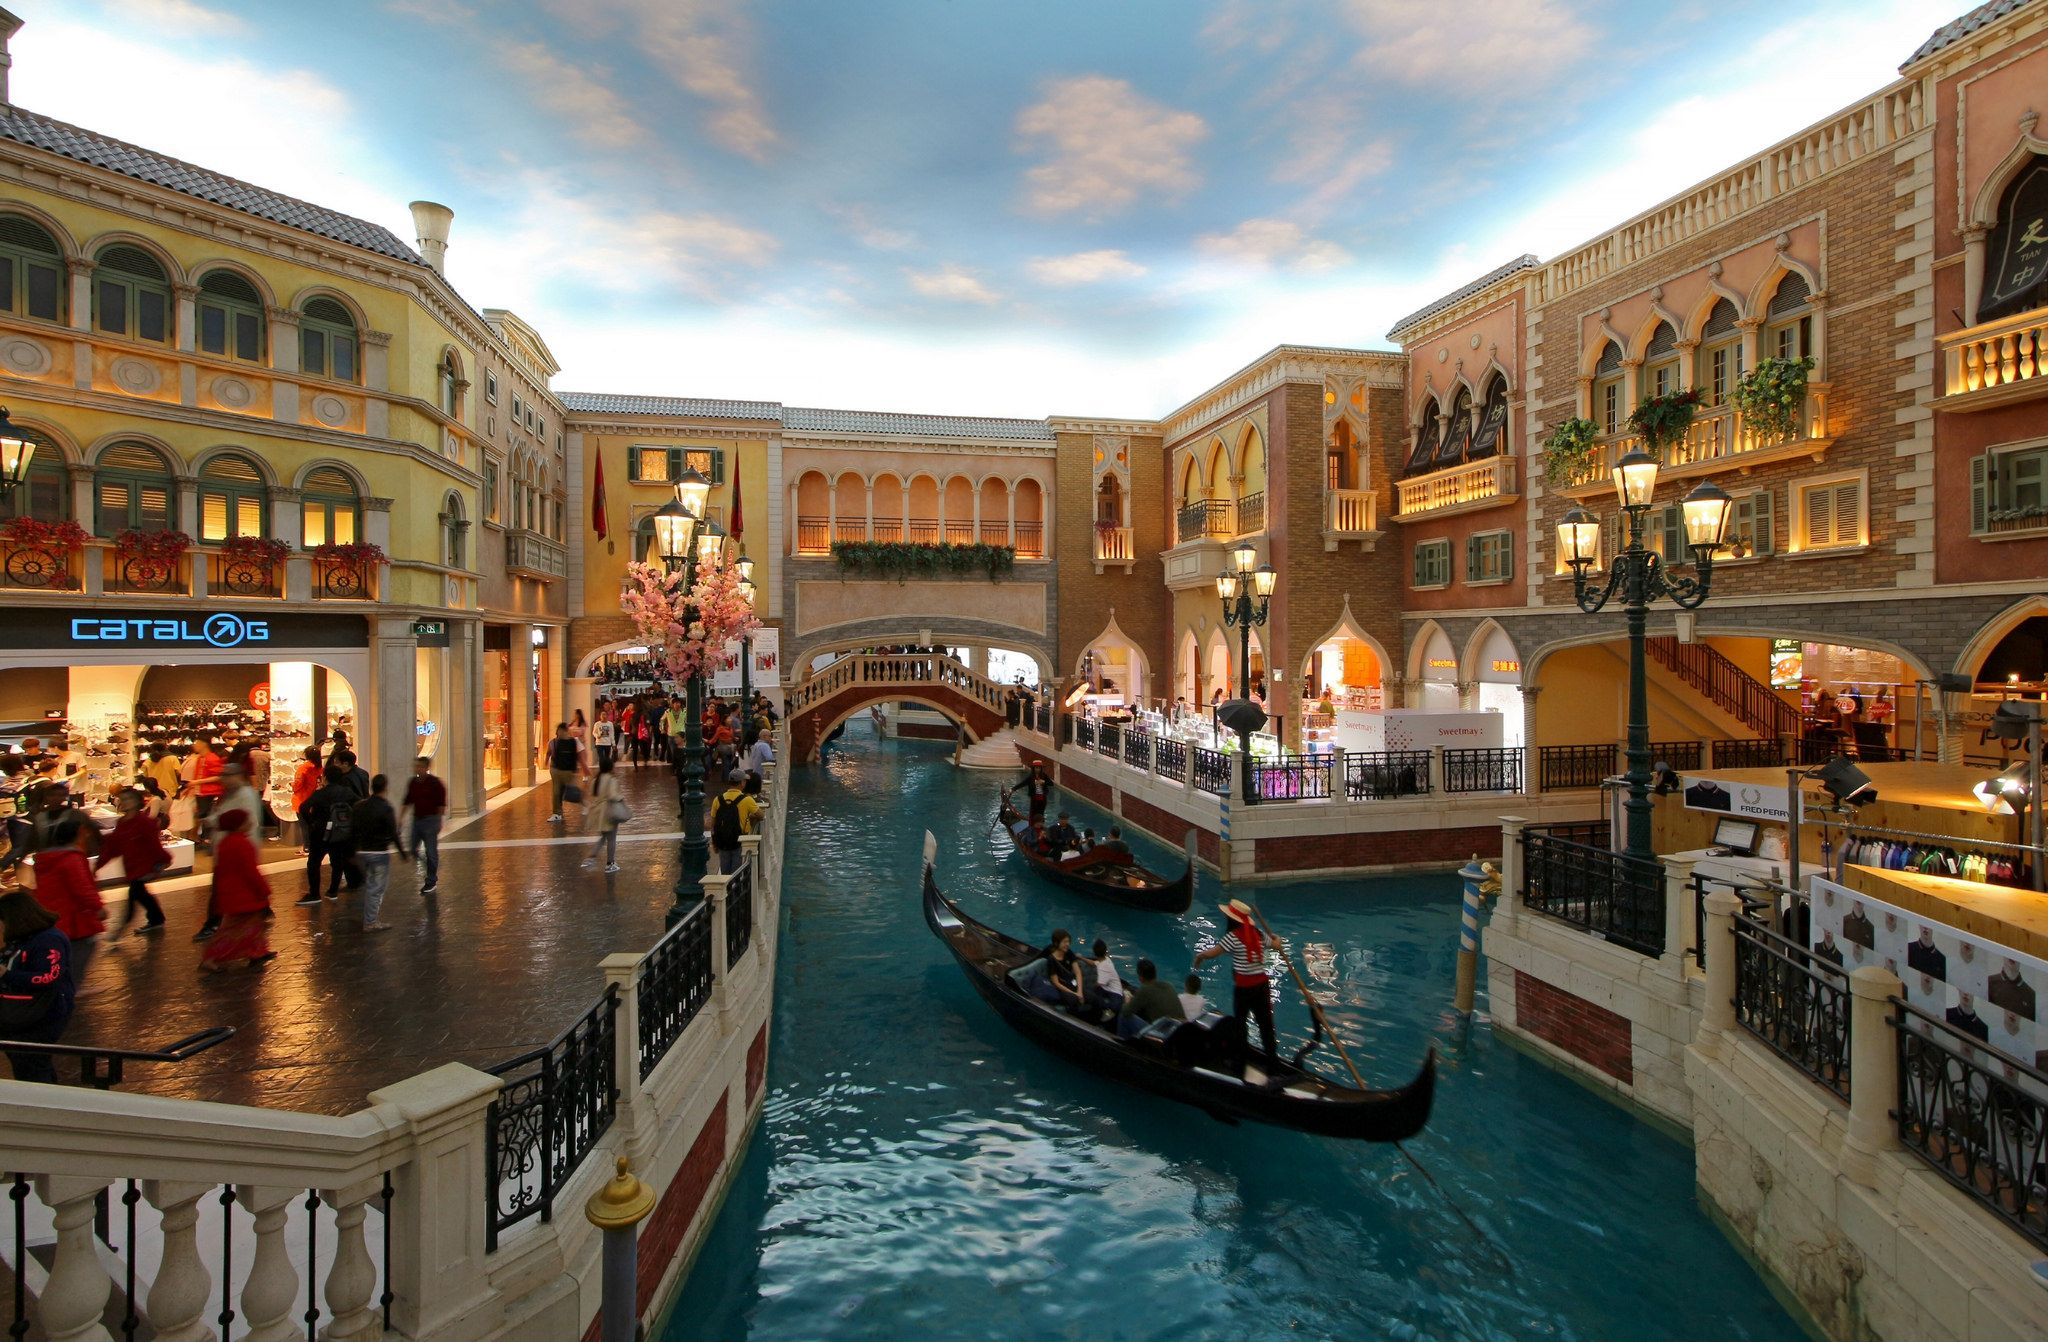 The Venetian Macao Casino Macau